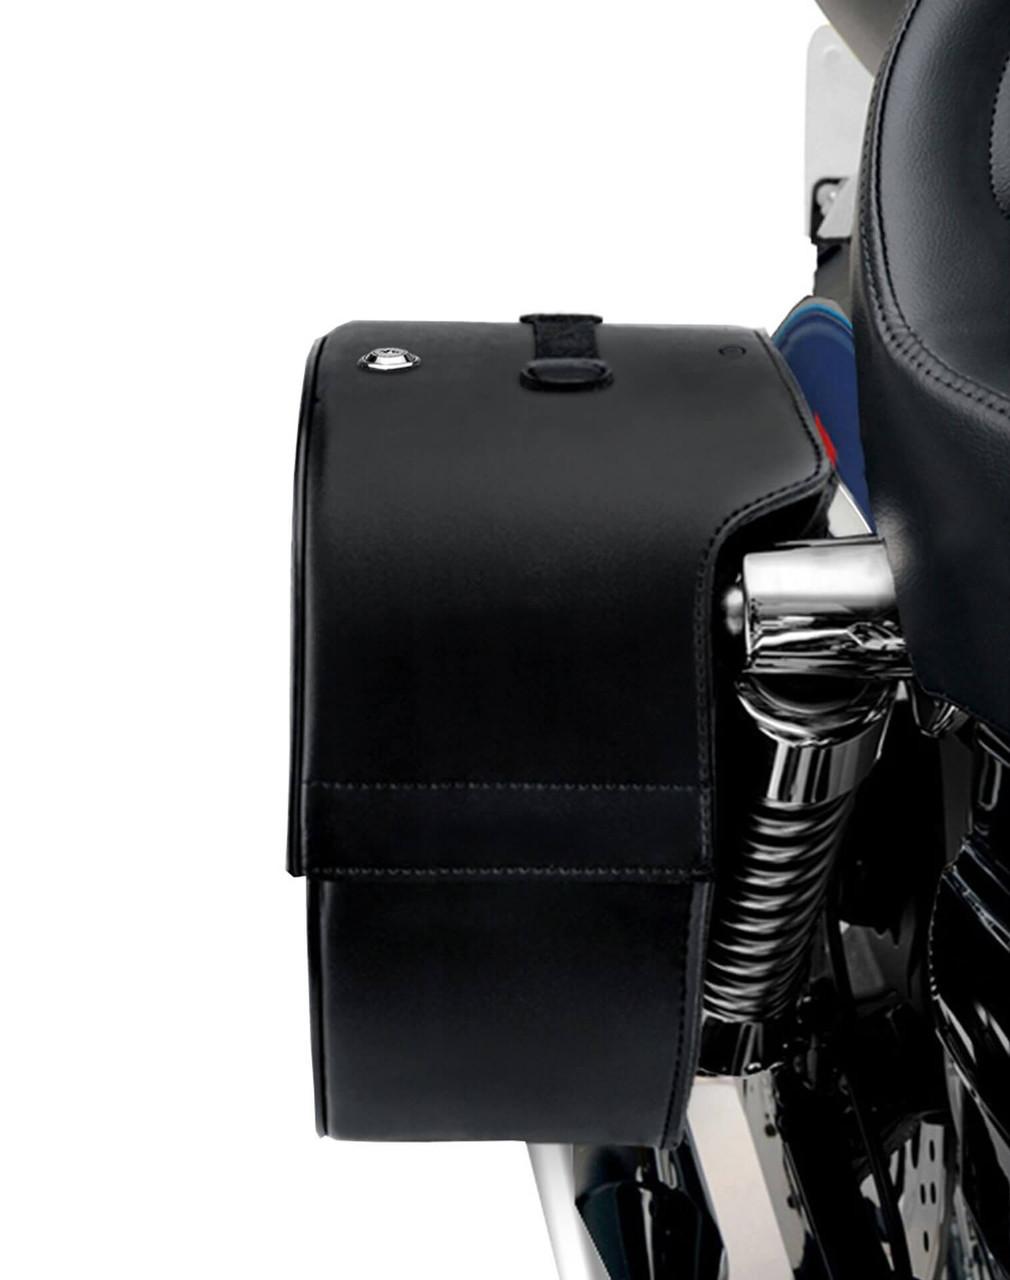 Honda 1100 Shadow Sabre Spear Shock Cutout Large Motorcycle Saddlebags shock cutout view